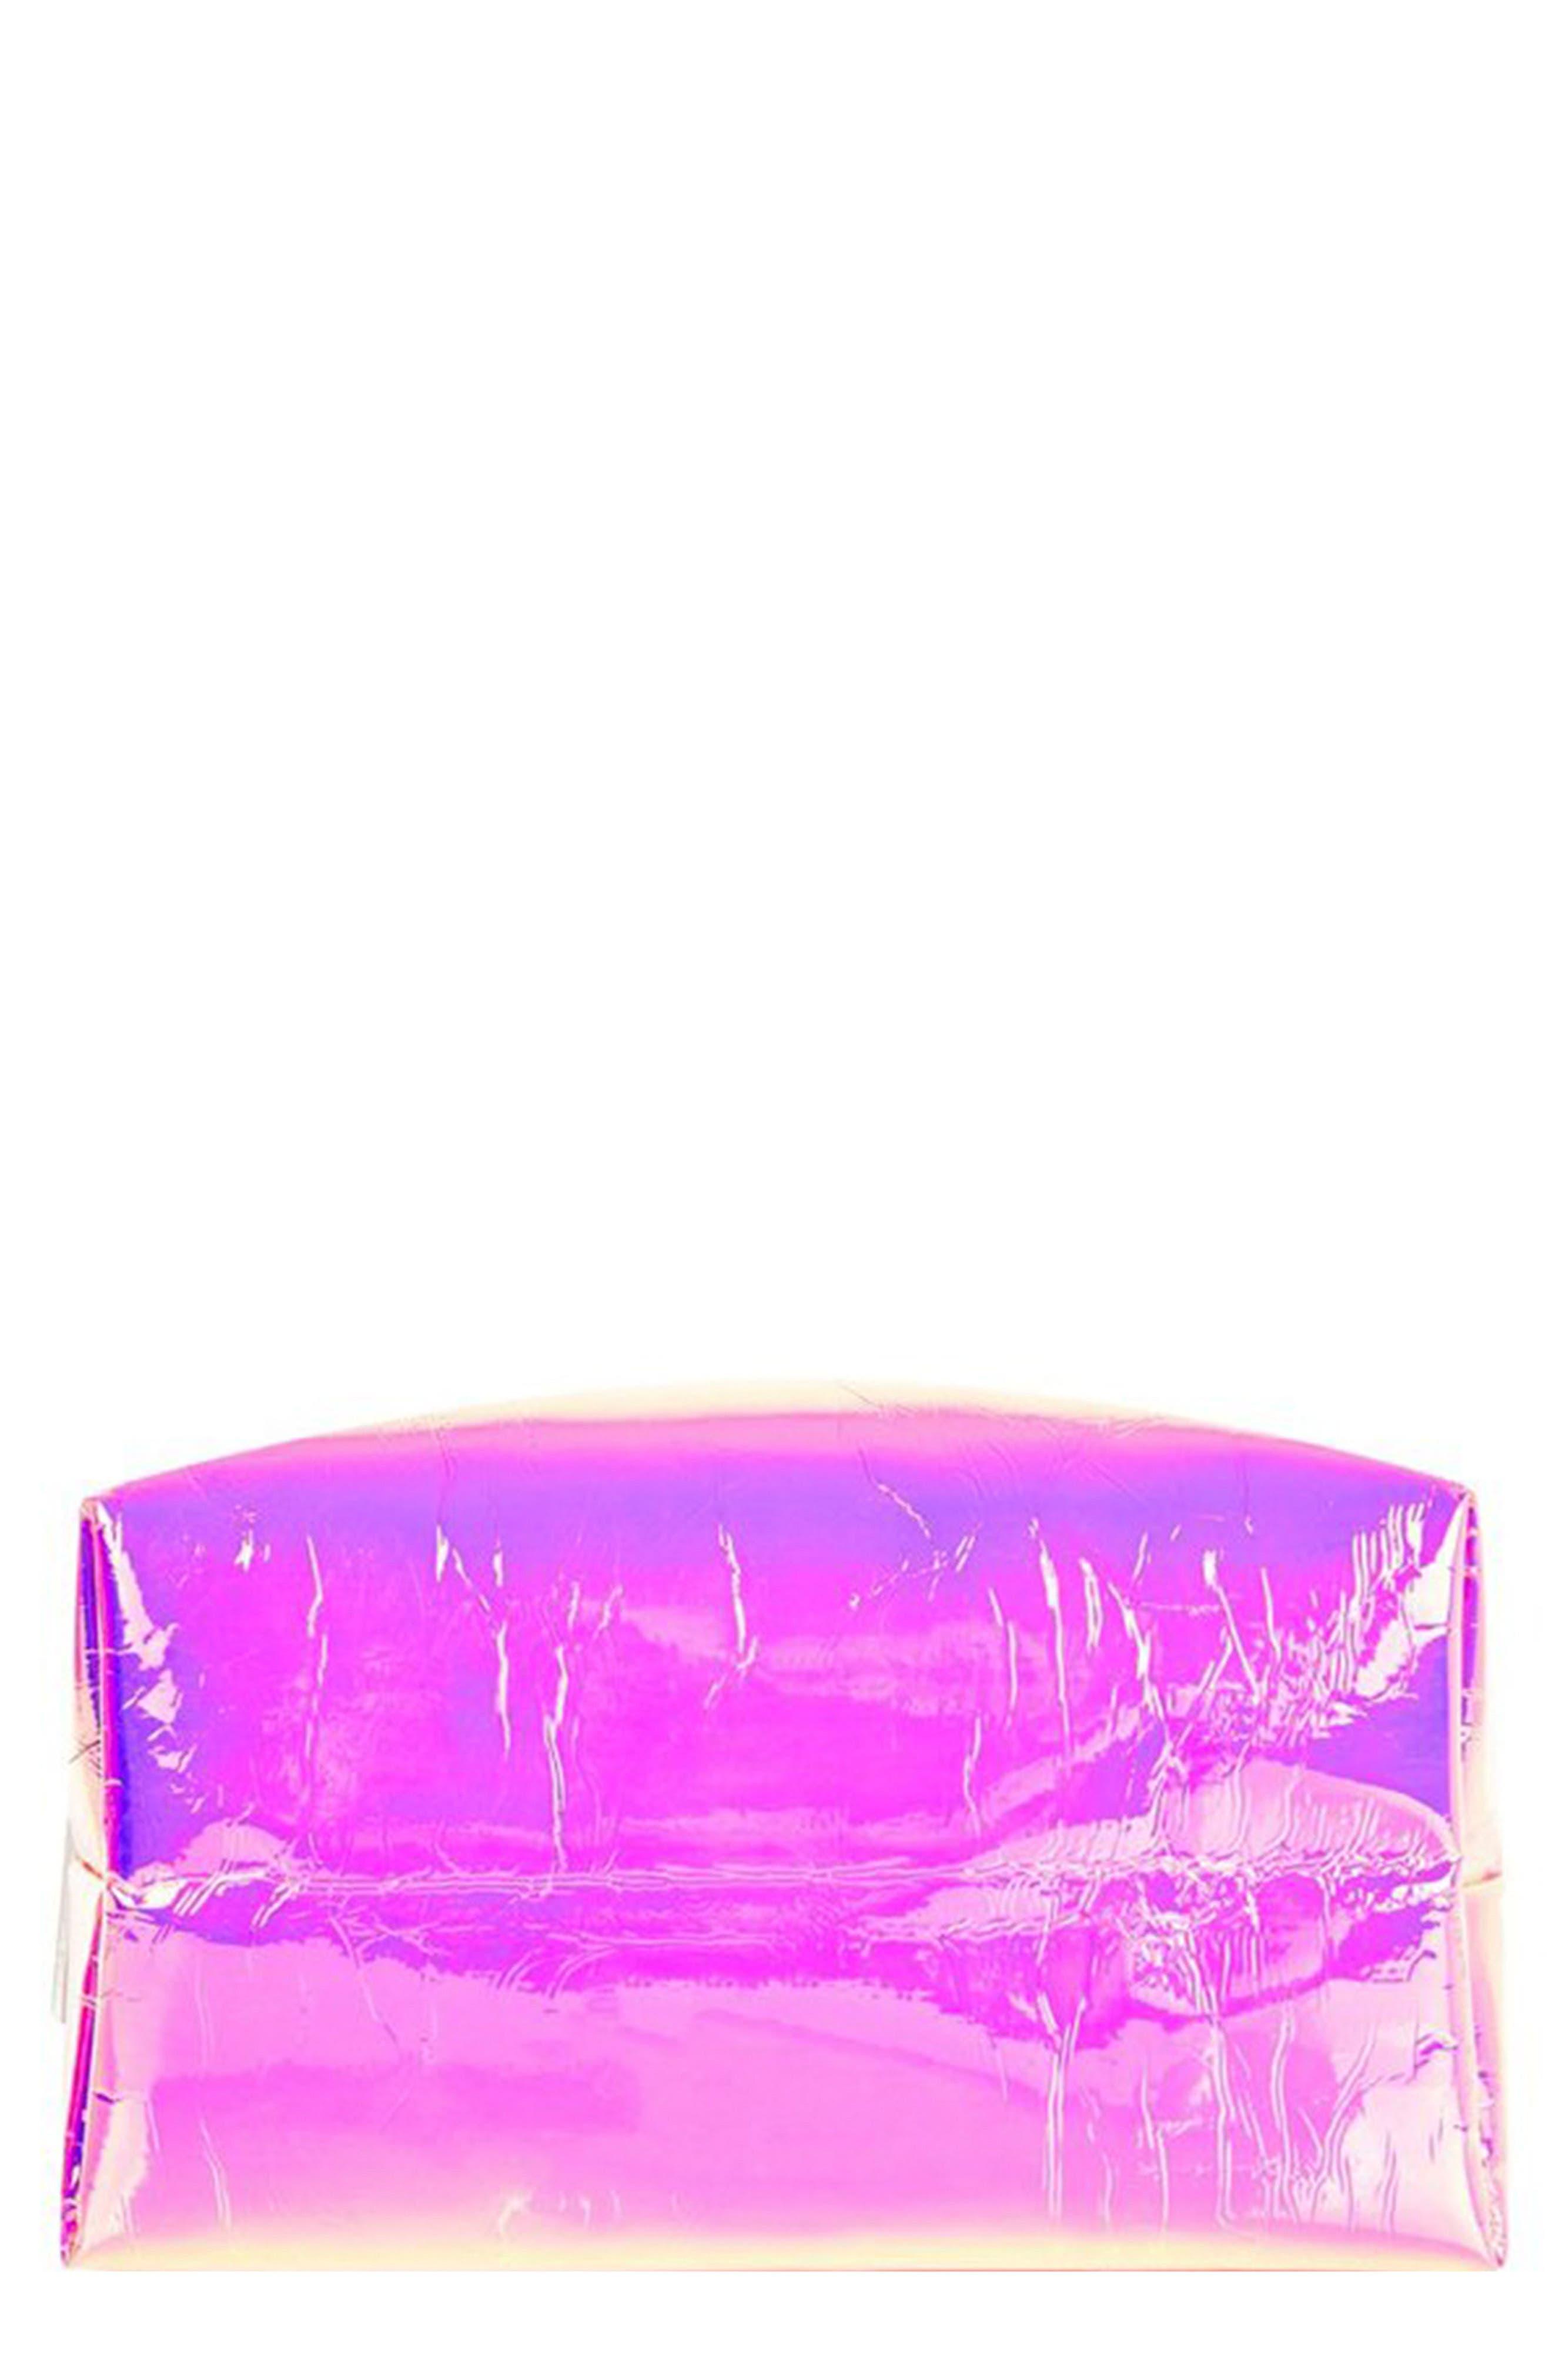 Pink Hologram Makeup Bag,                             Main thumbnail 1, color,                             NO COLOR